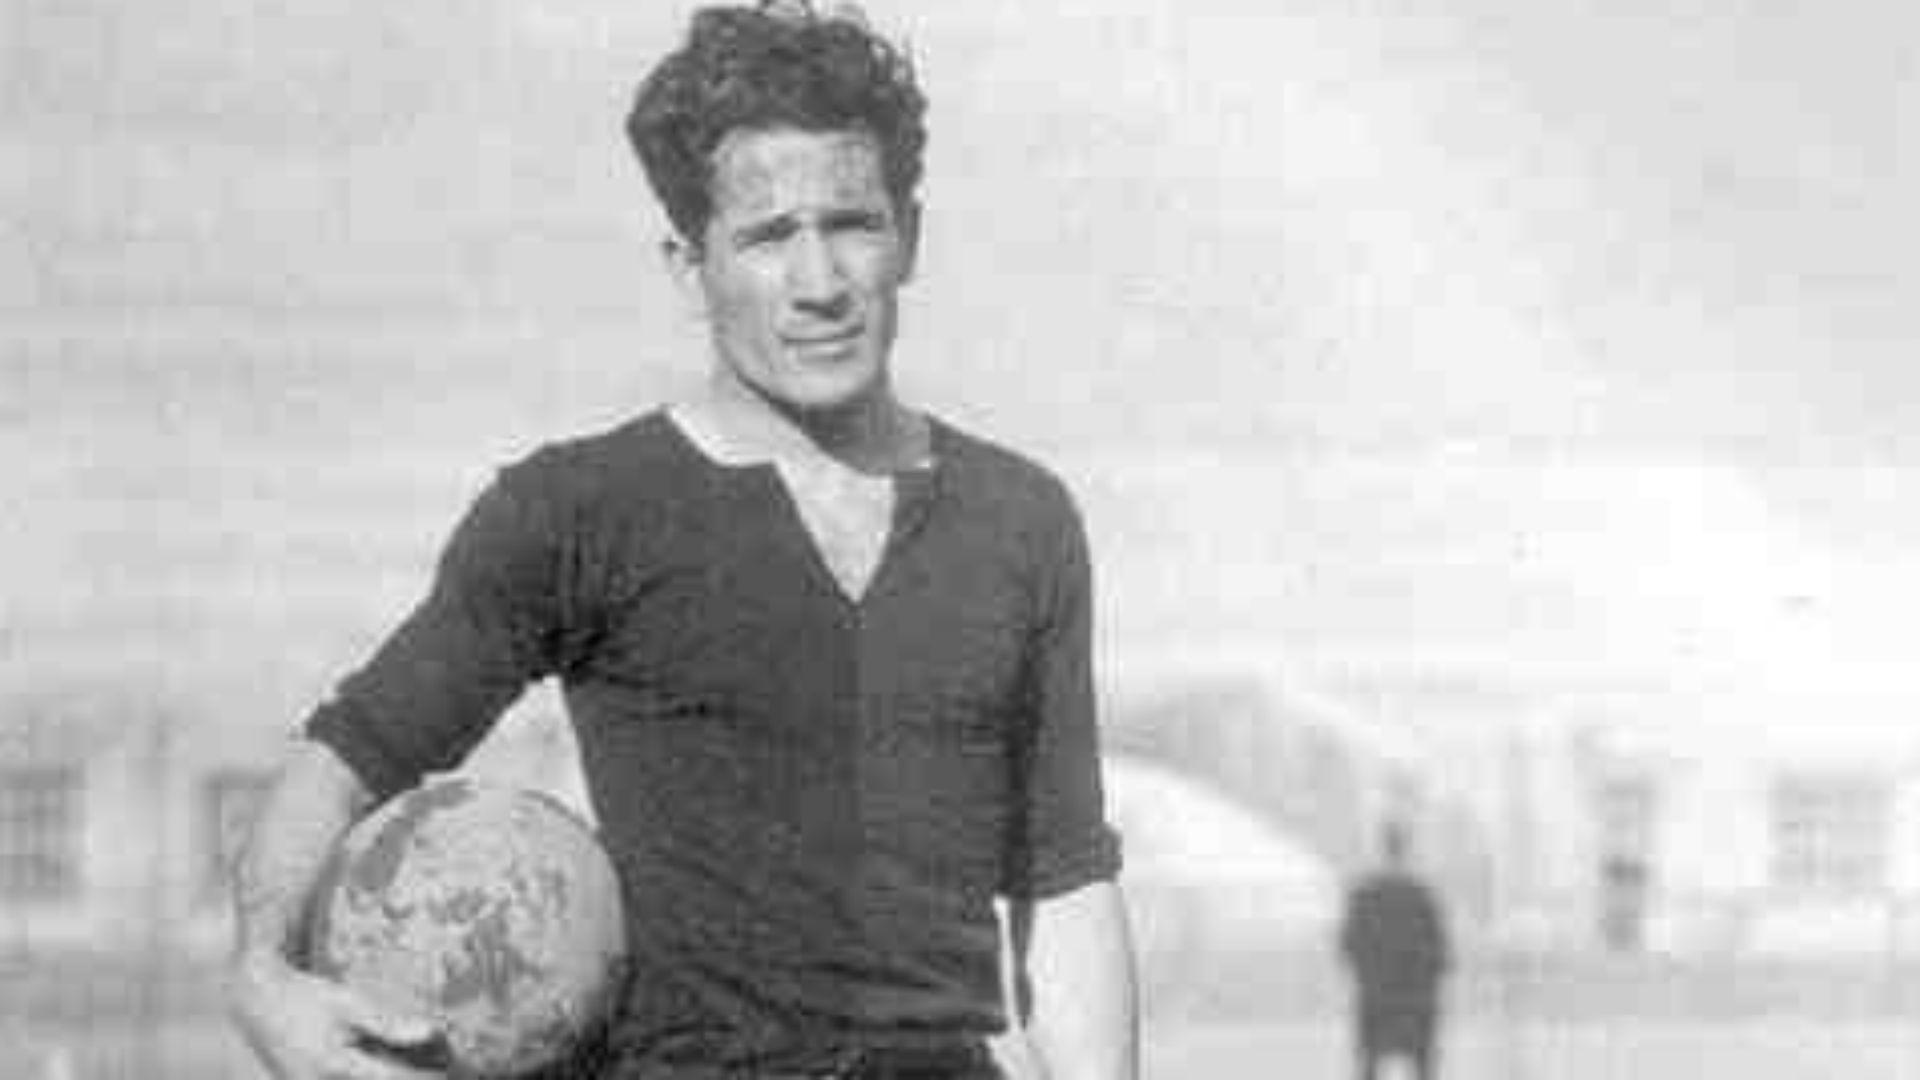 Manuel Rosas Mexico 1930